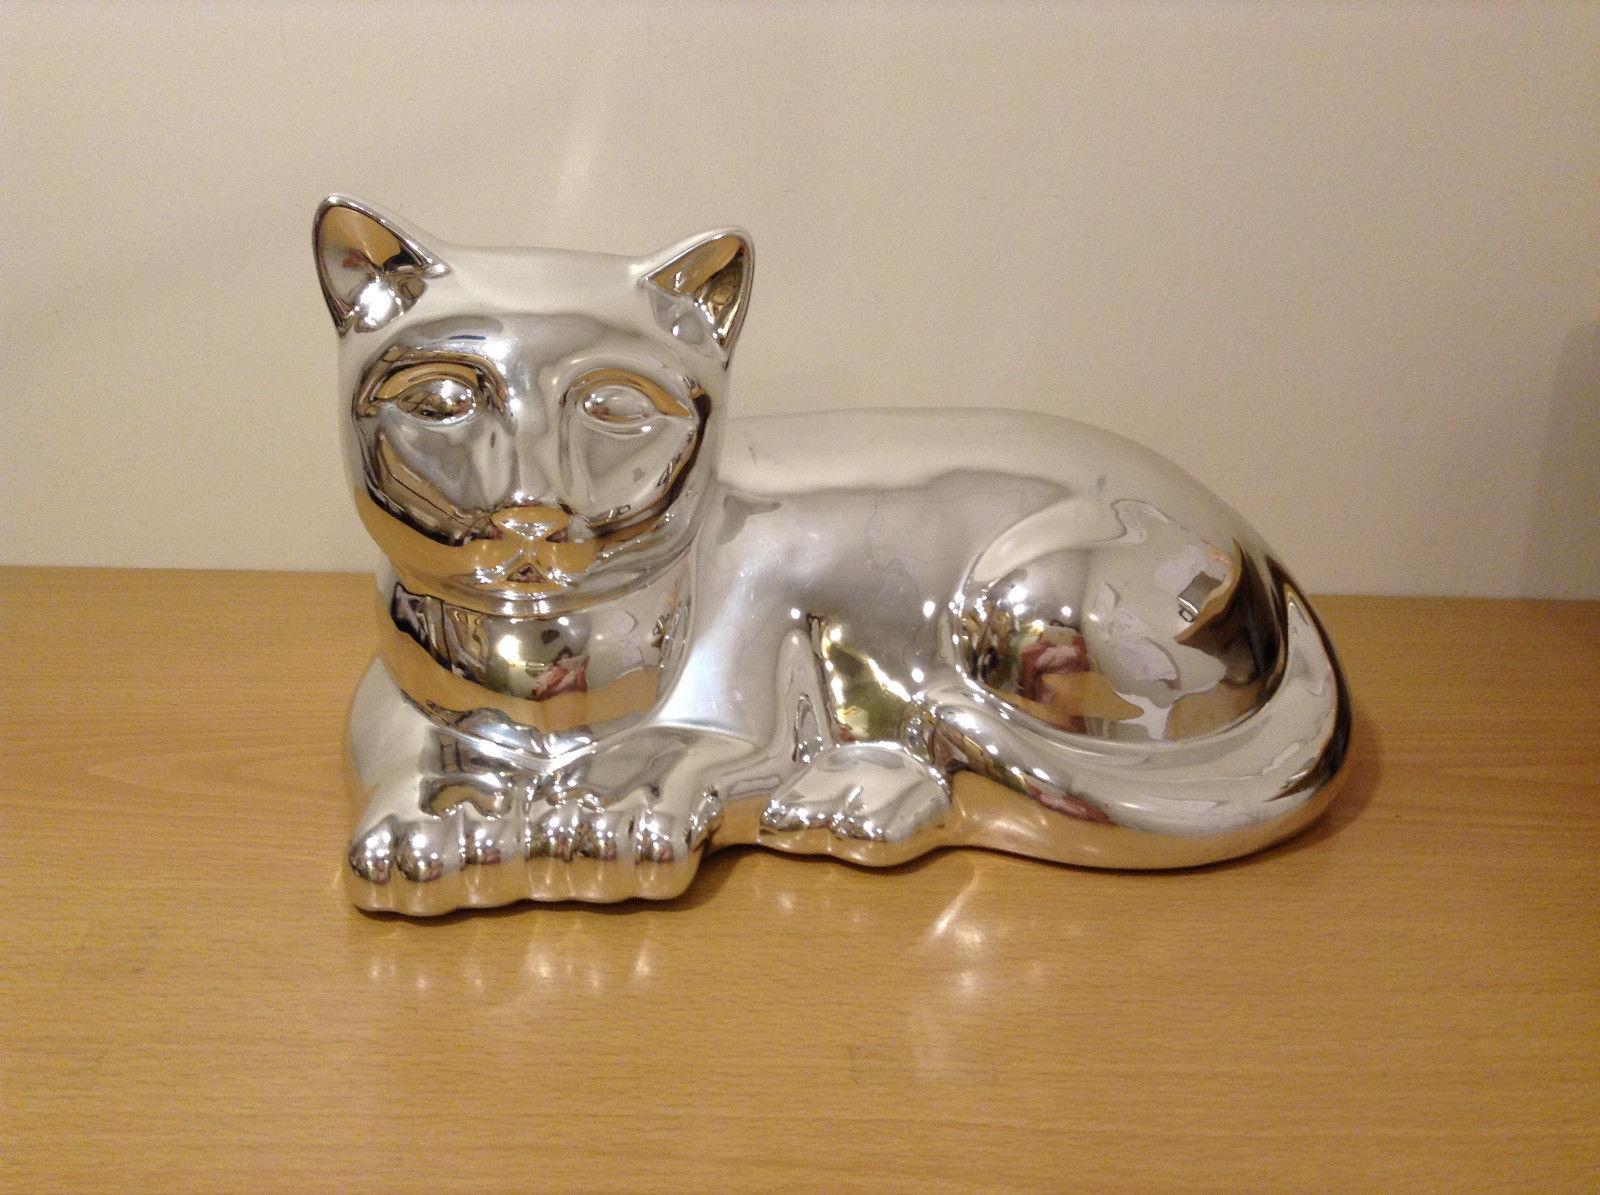 Reclining Metallic Silver Cat Figure Figurine Mid Century Midcentury Home Decor